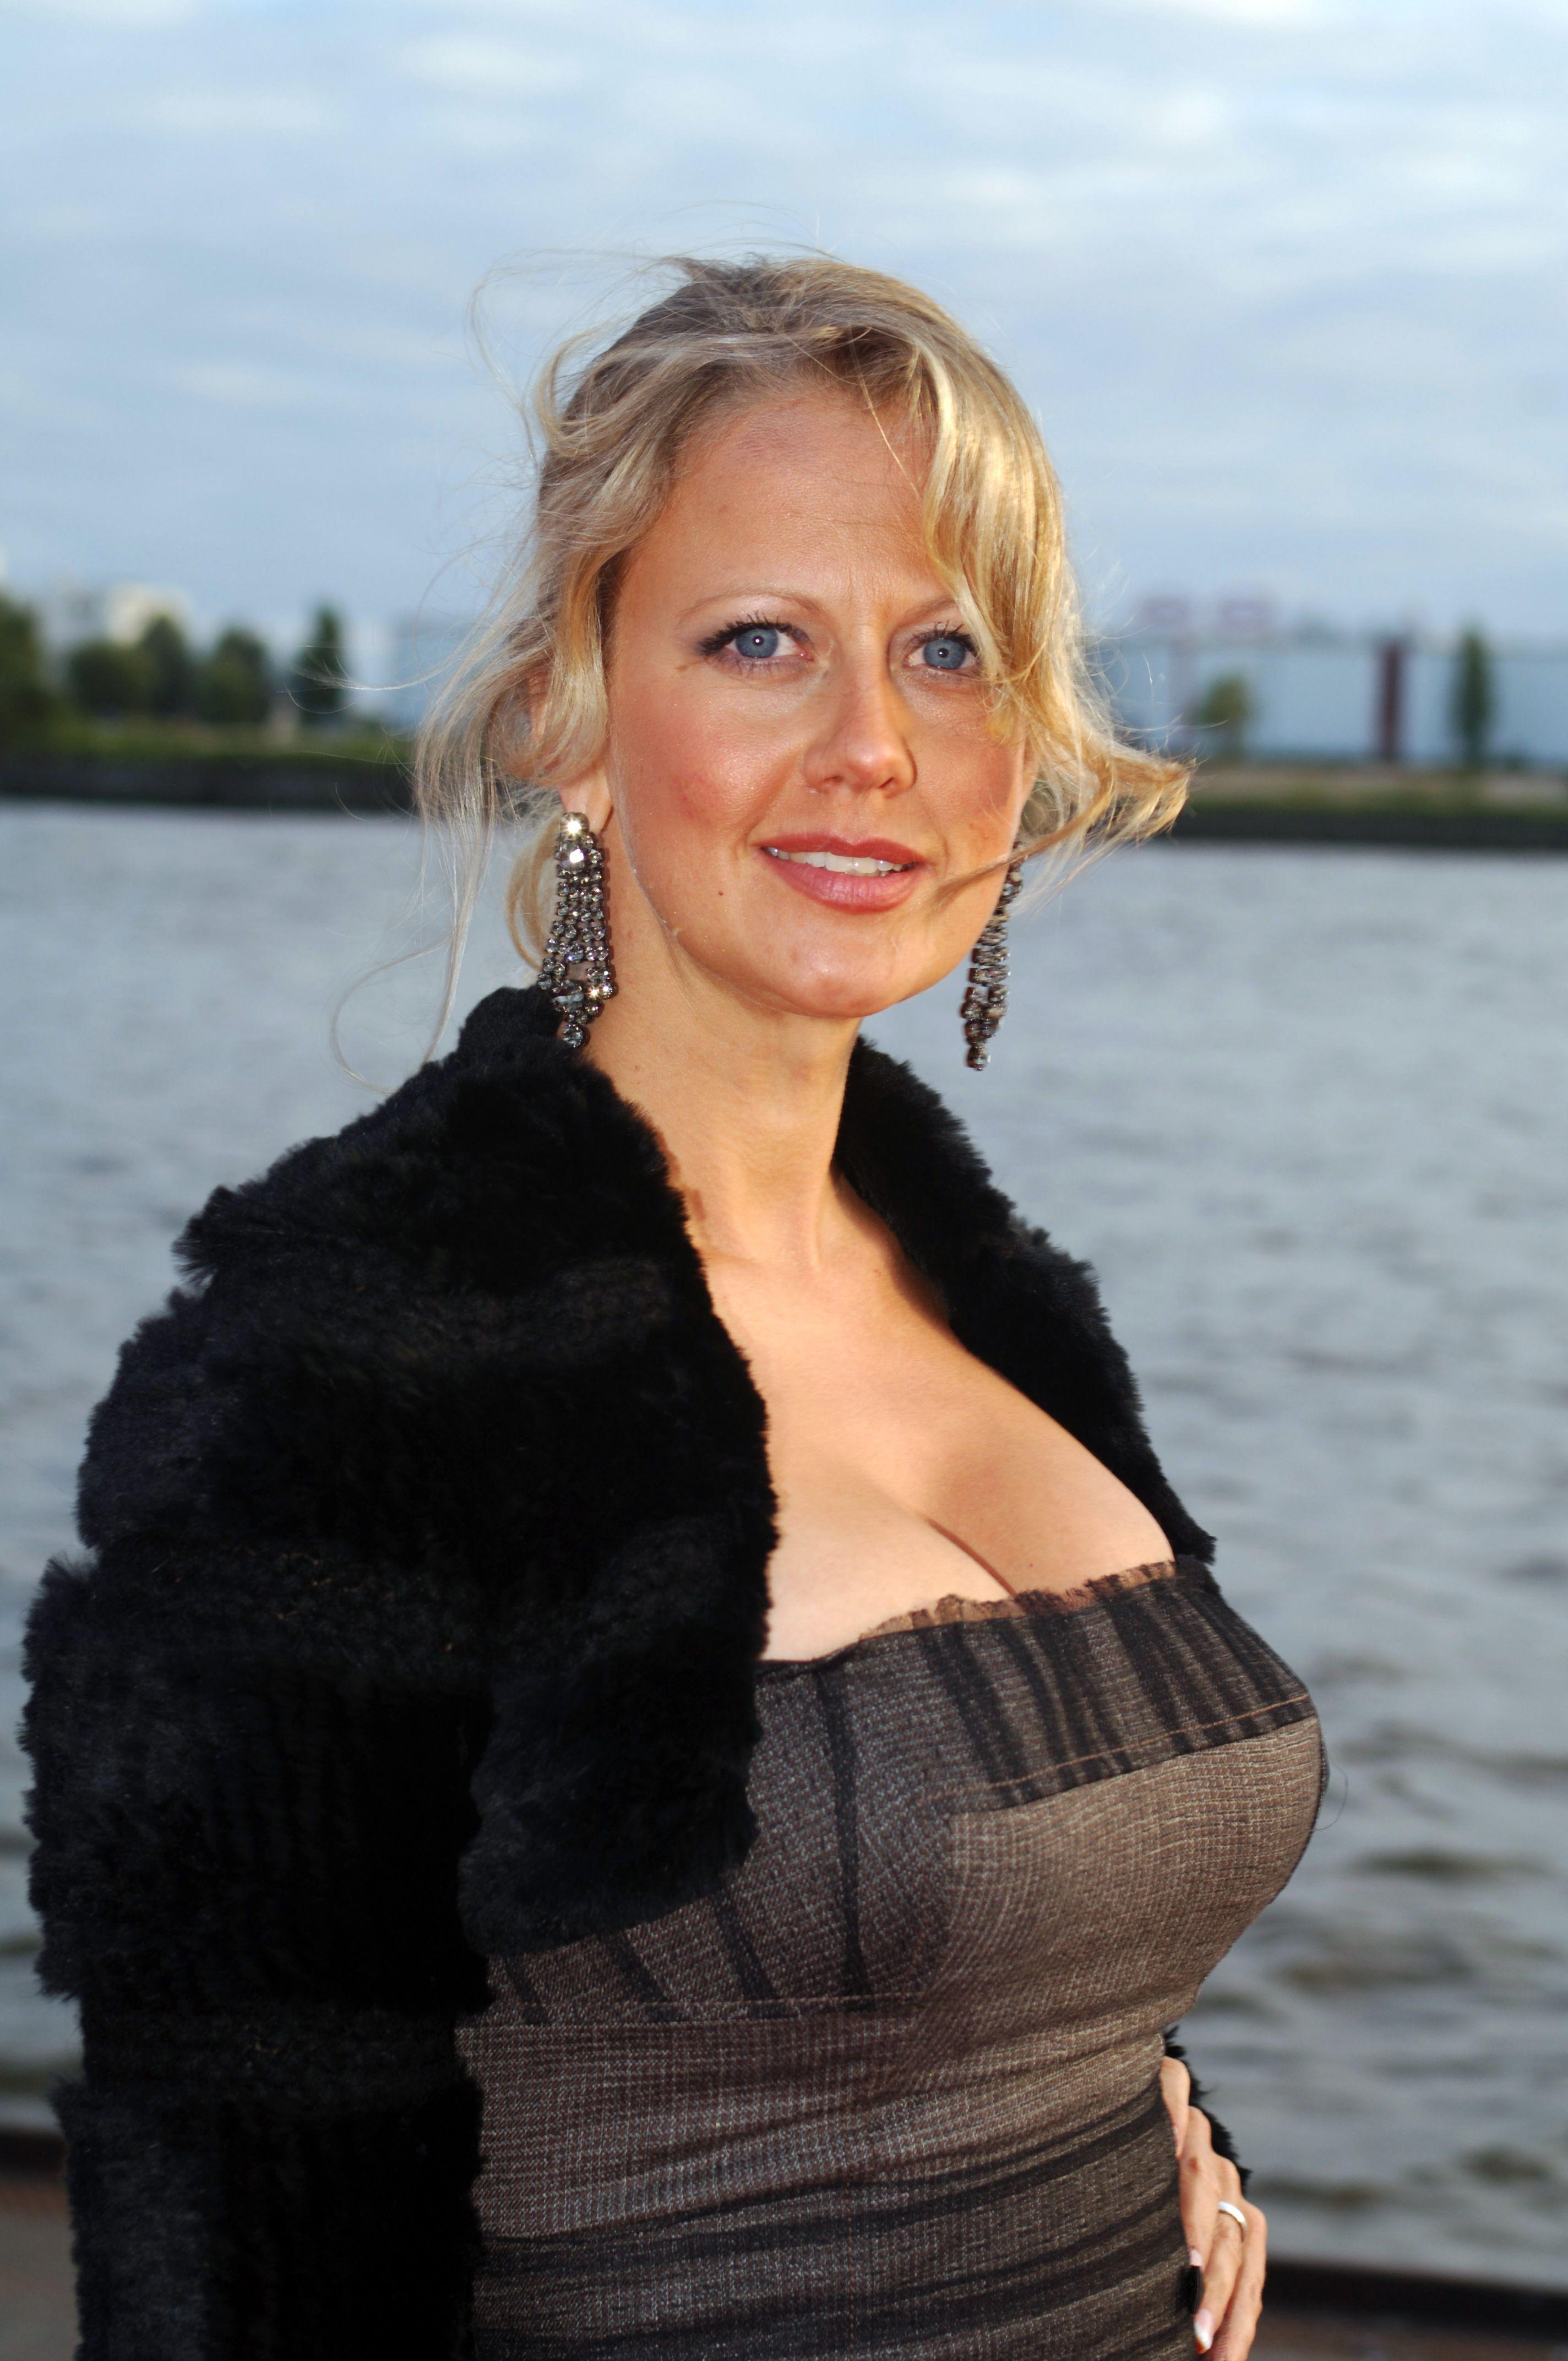 Barbara Schoeneberger. #Barbara #Schoeneberger